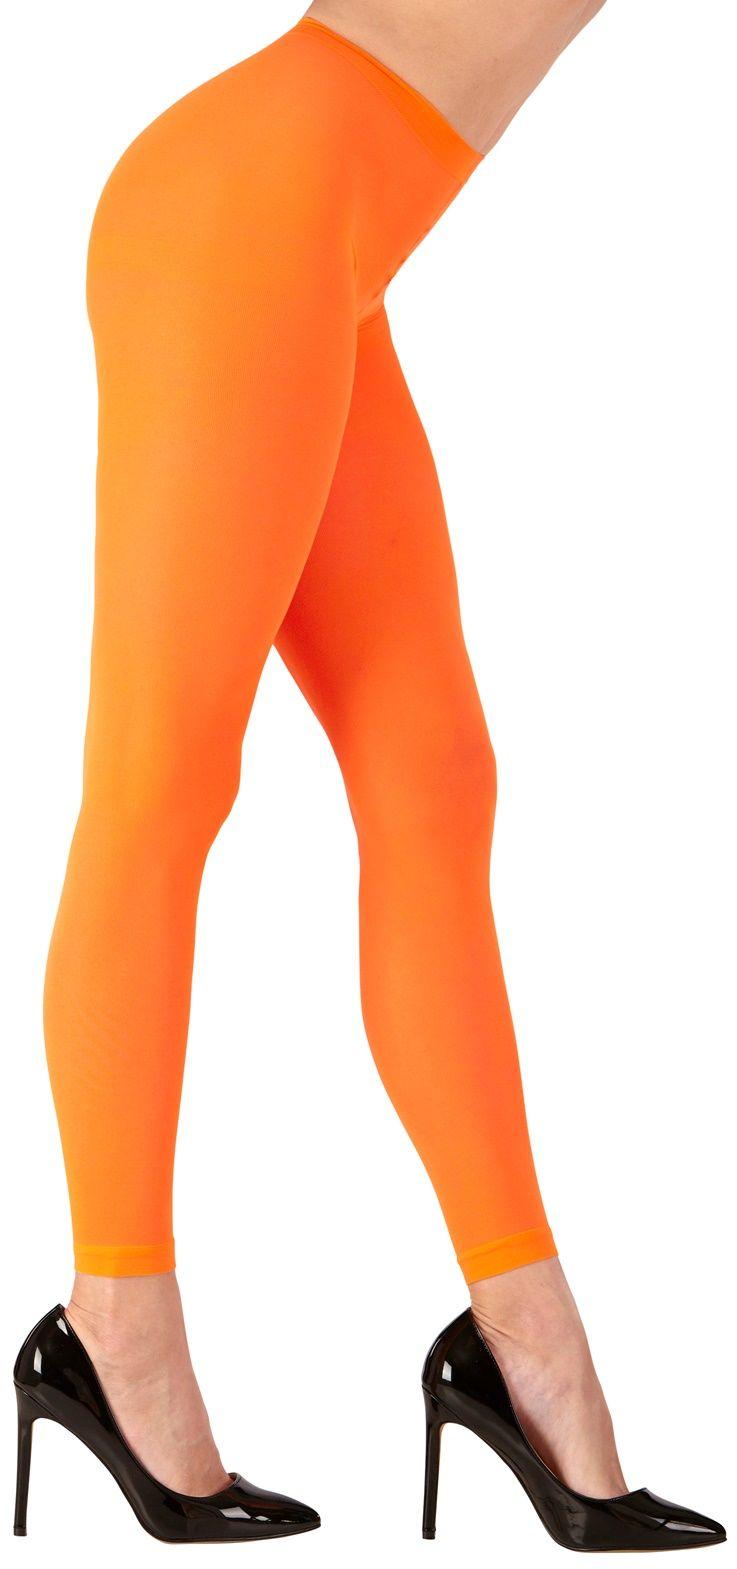 Oranje neon legging One-size-volwassenen